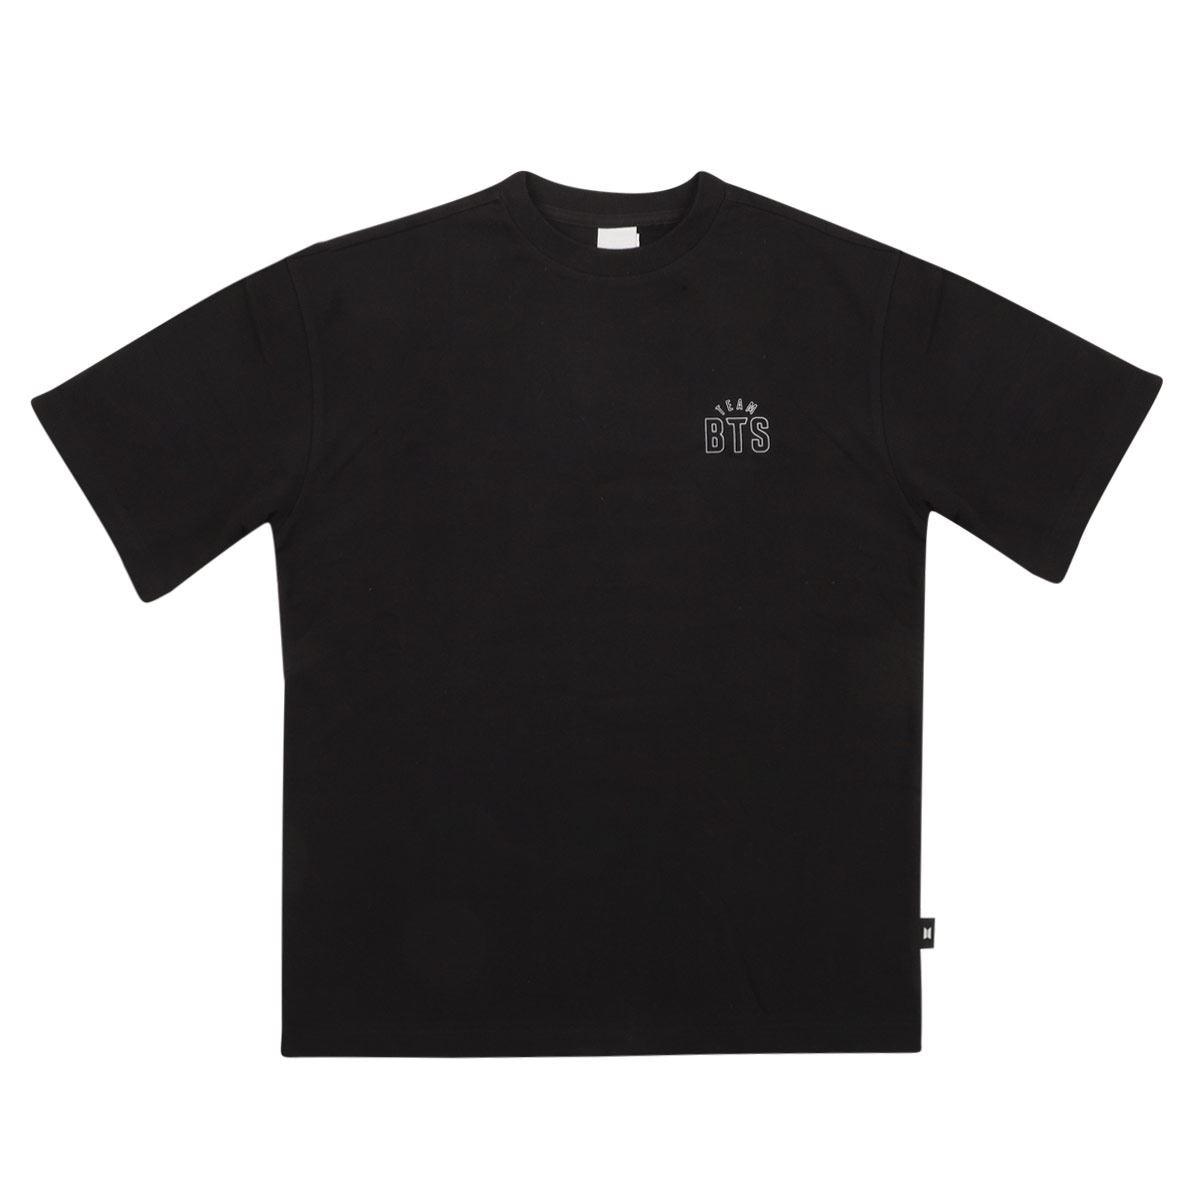 Camiseta miembro BTS JIN extra grande / Team BTS tee JIN XL